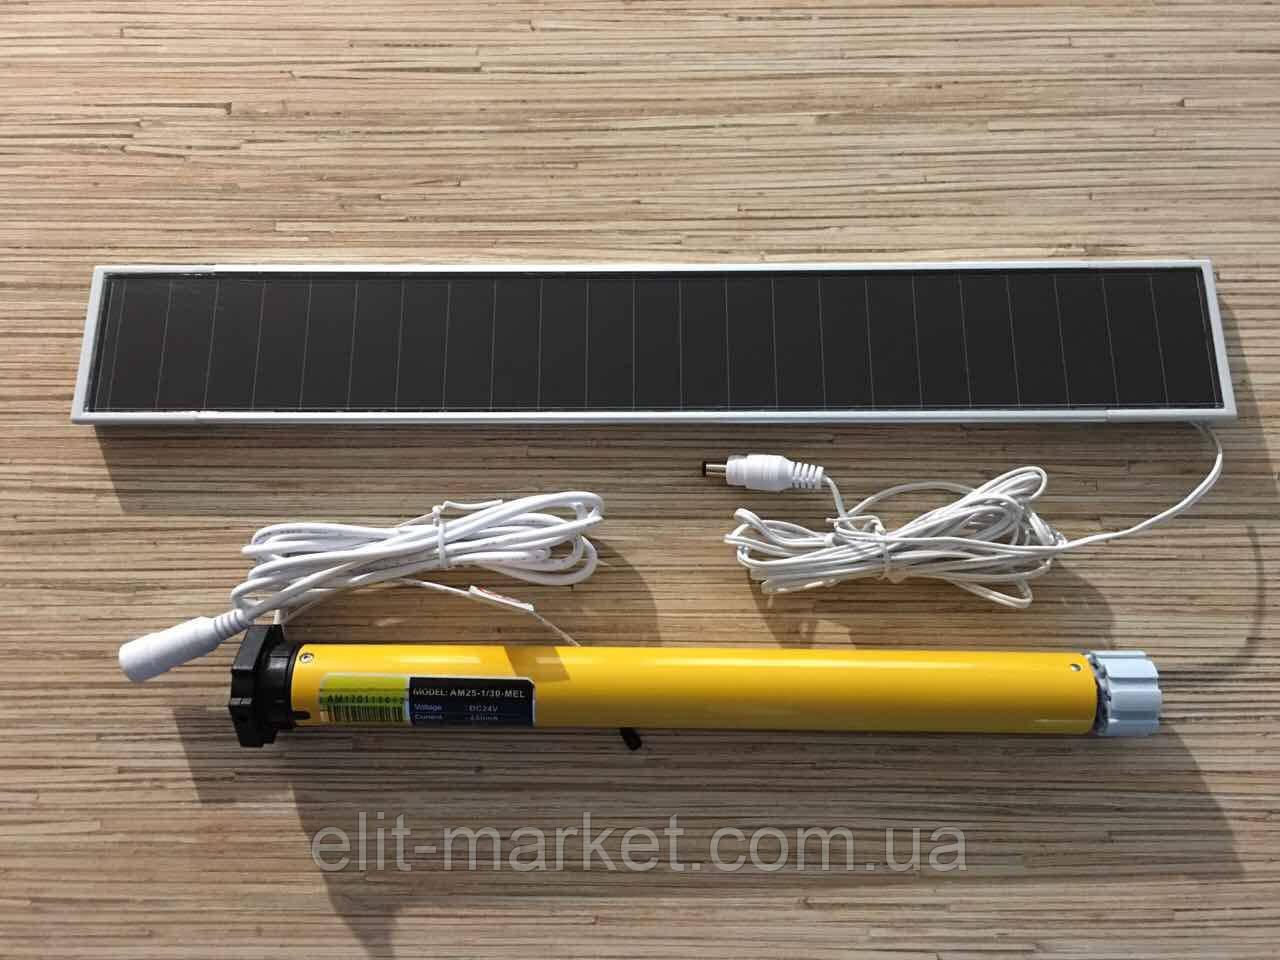 Электропривод AM25-1/30-MEL, фото 1